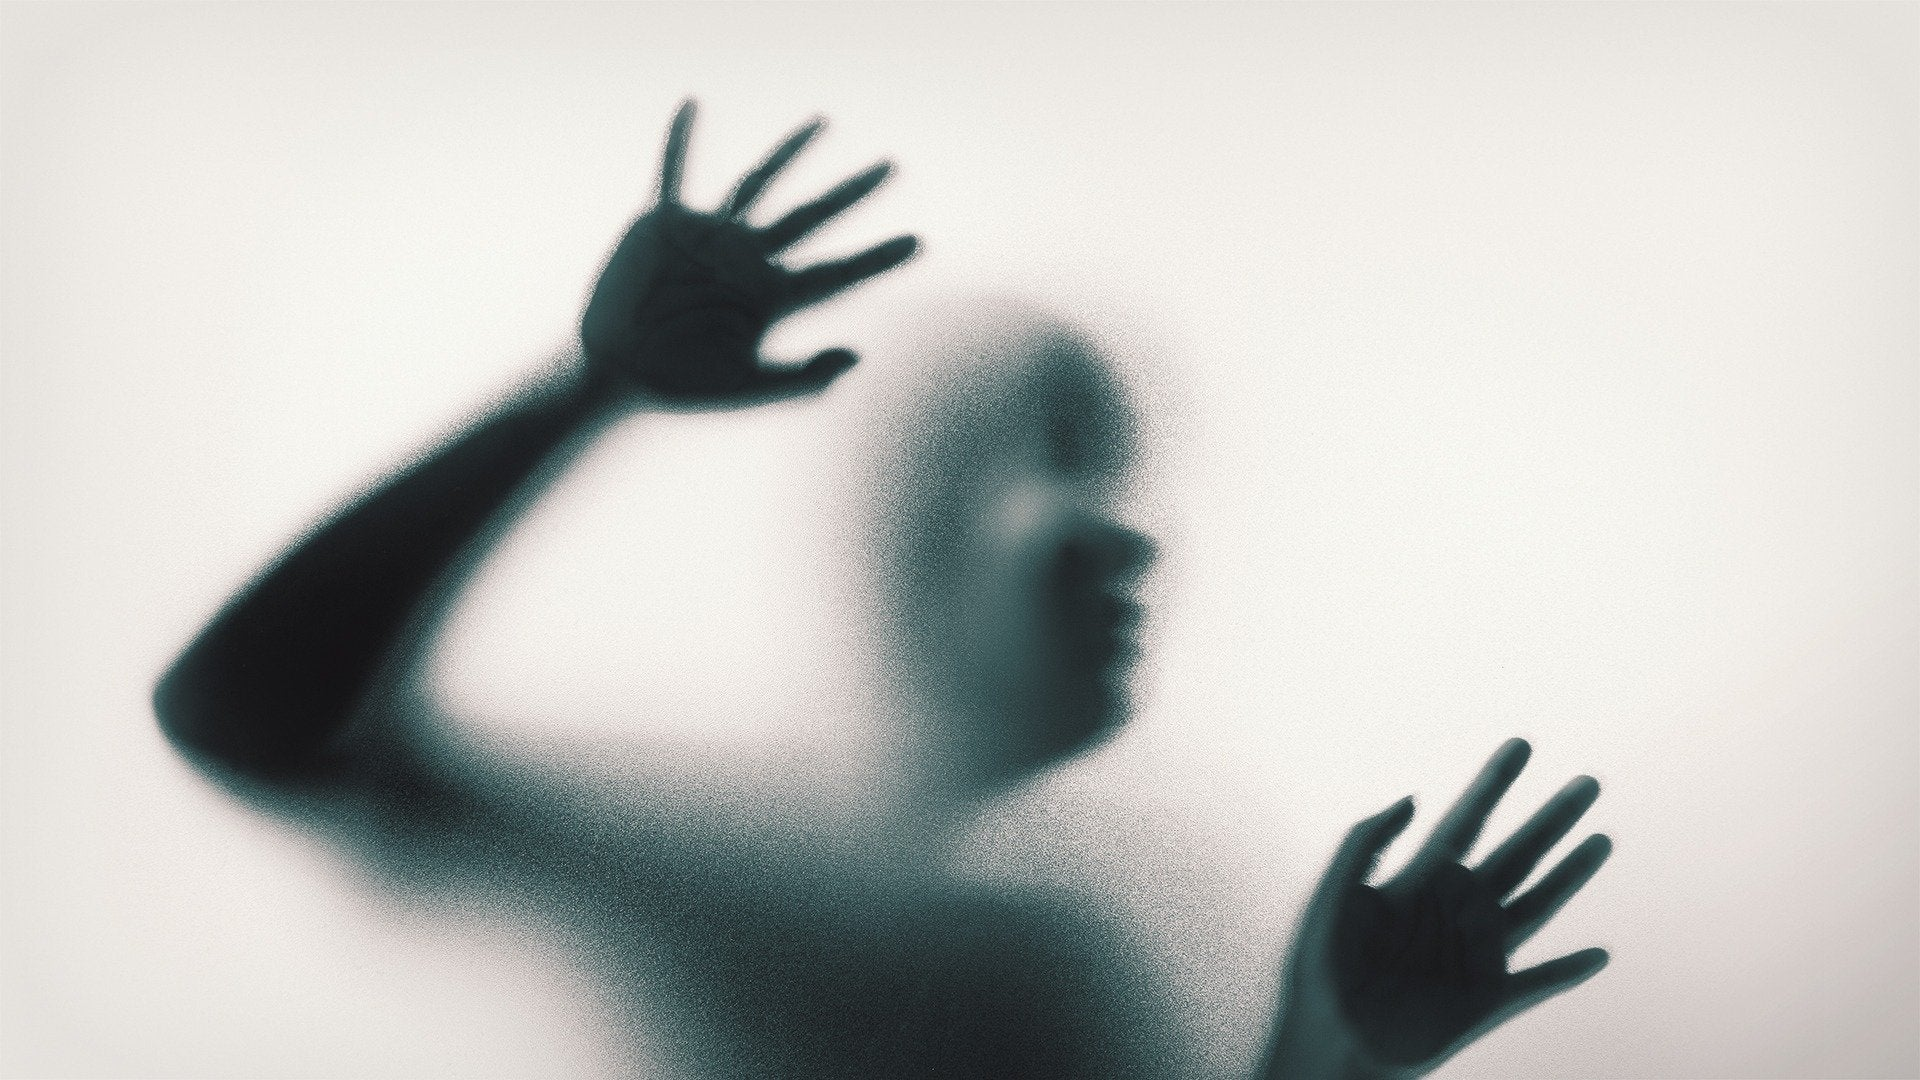 The Shadows of Death